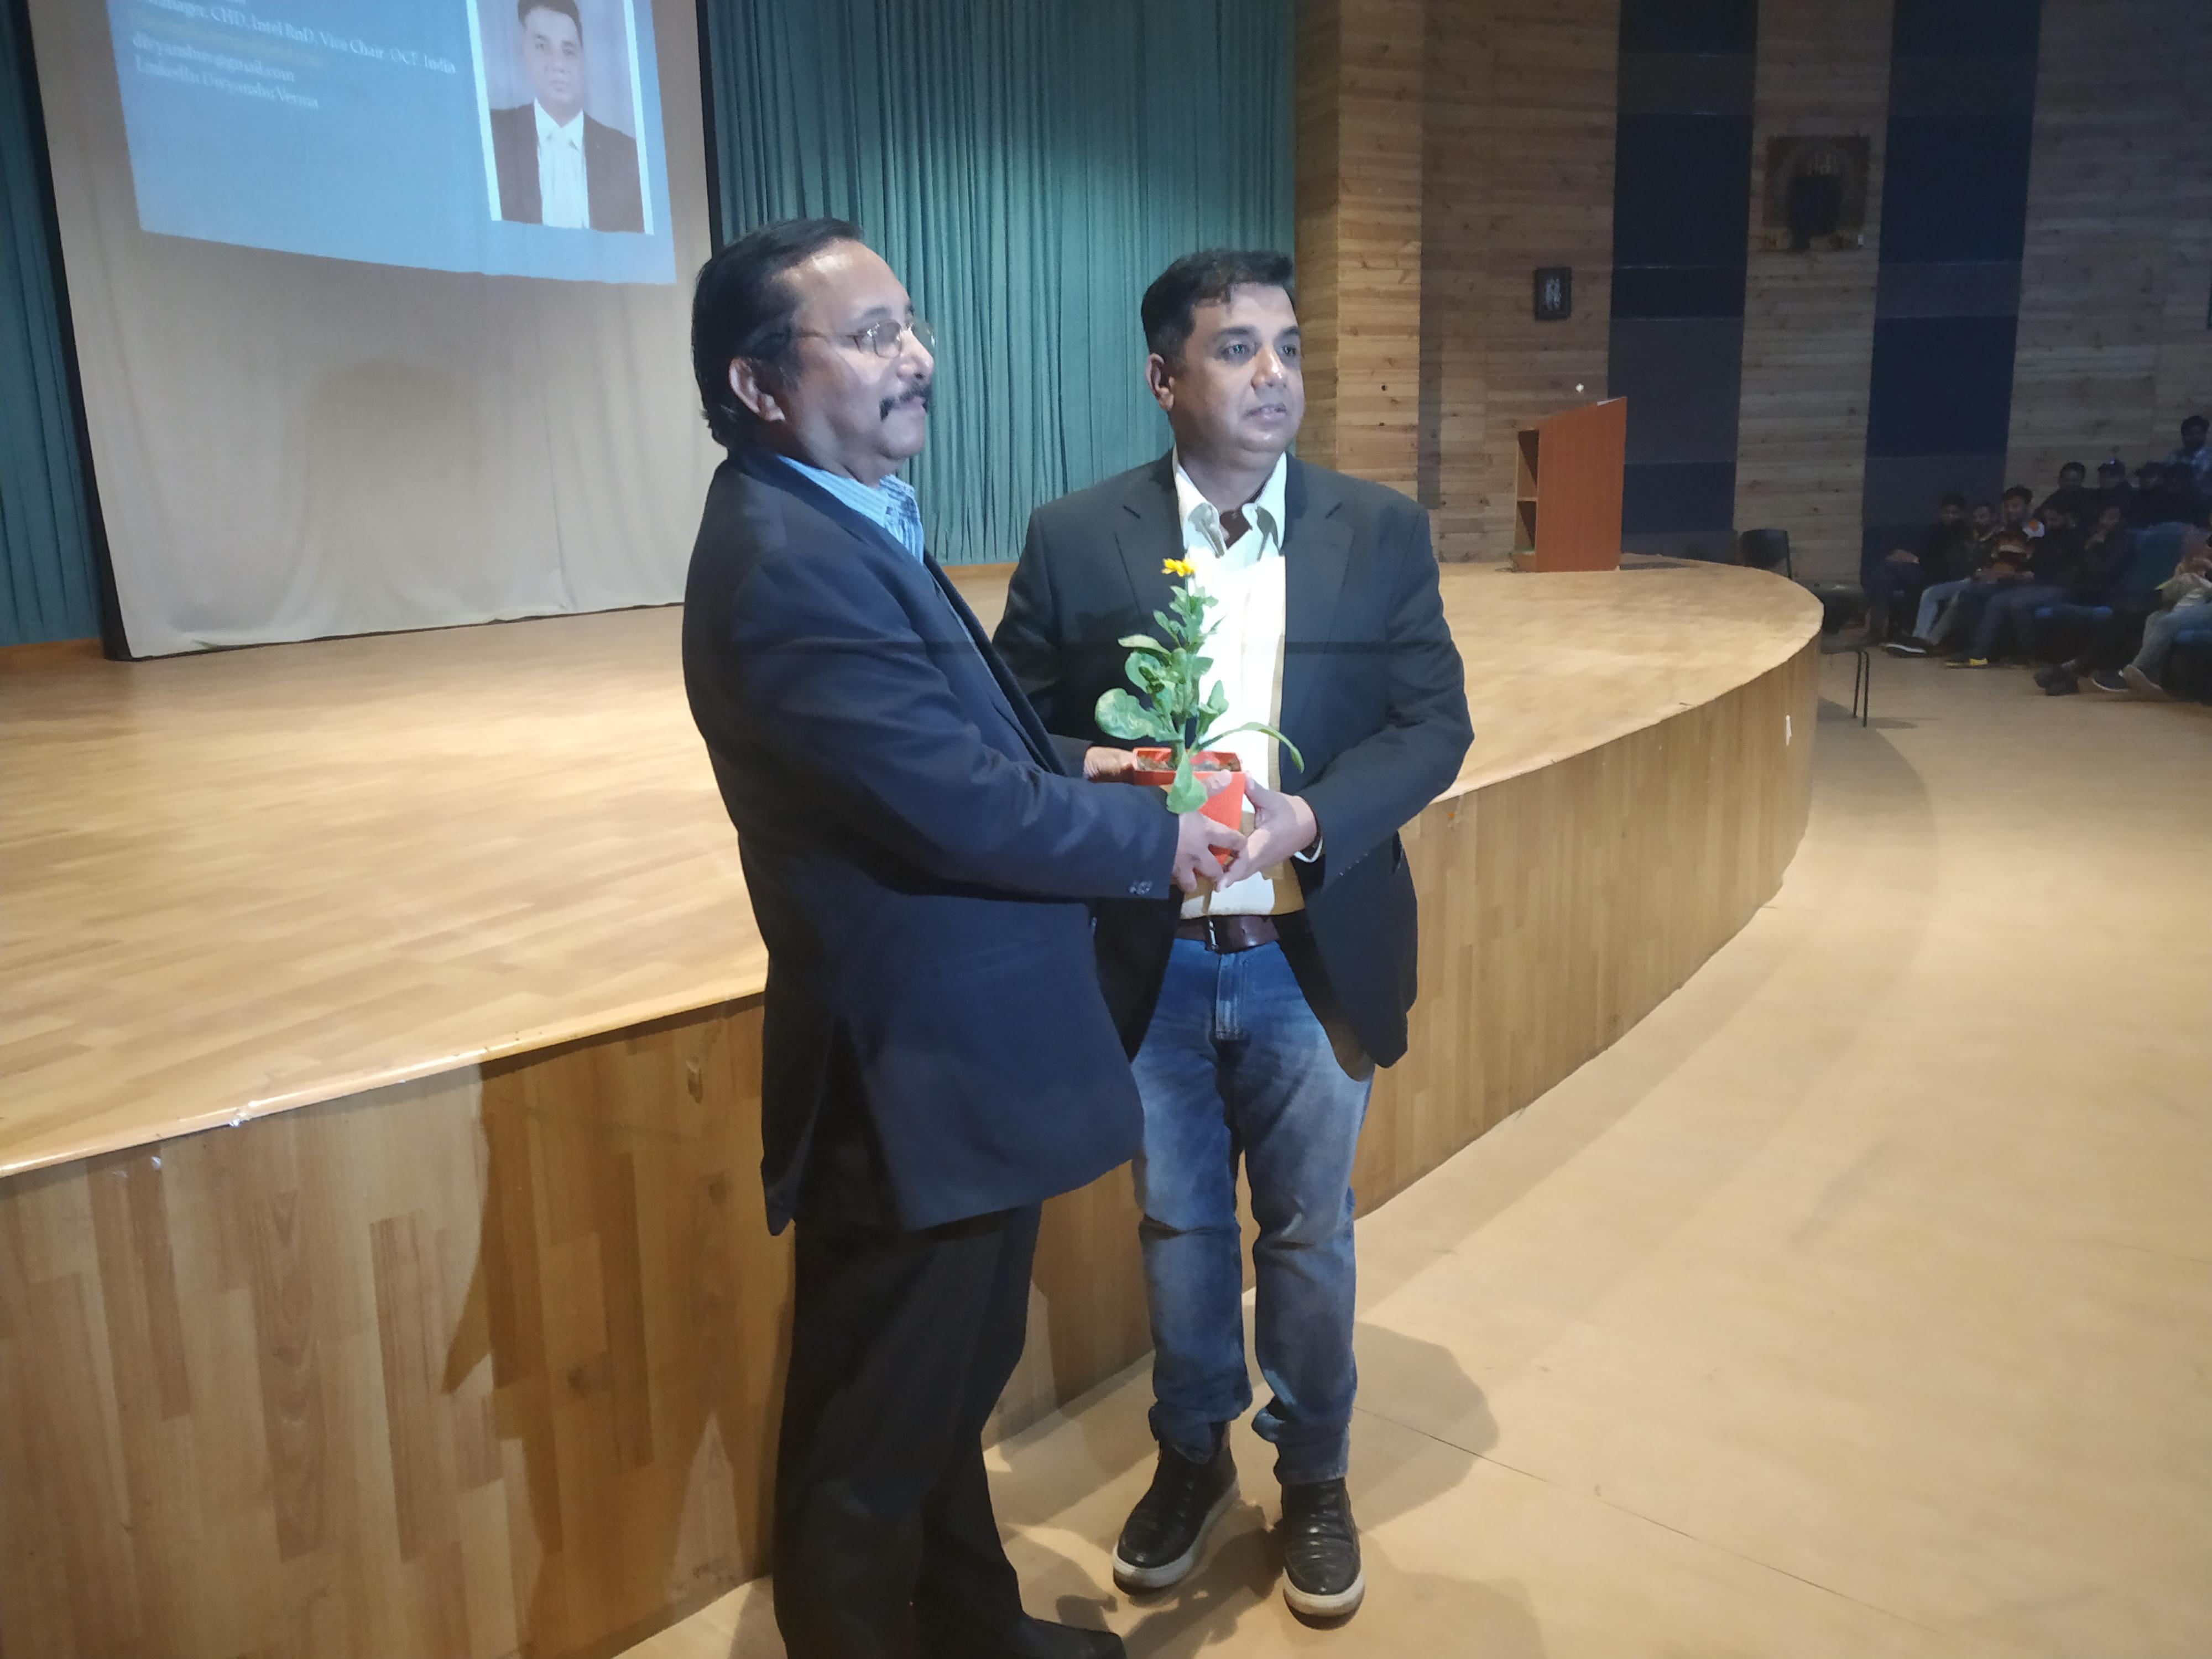 Expert Lecture By Mr. Divyanshu Verma (IITD & IIM B), Sr, Manager Intel Technologies Bangalore